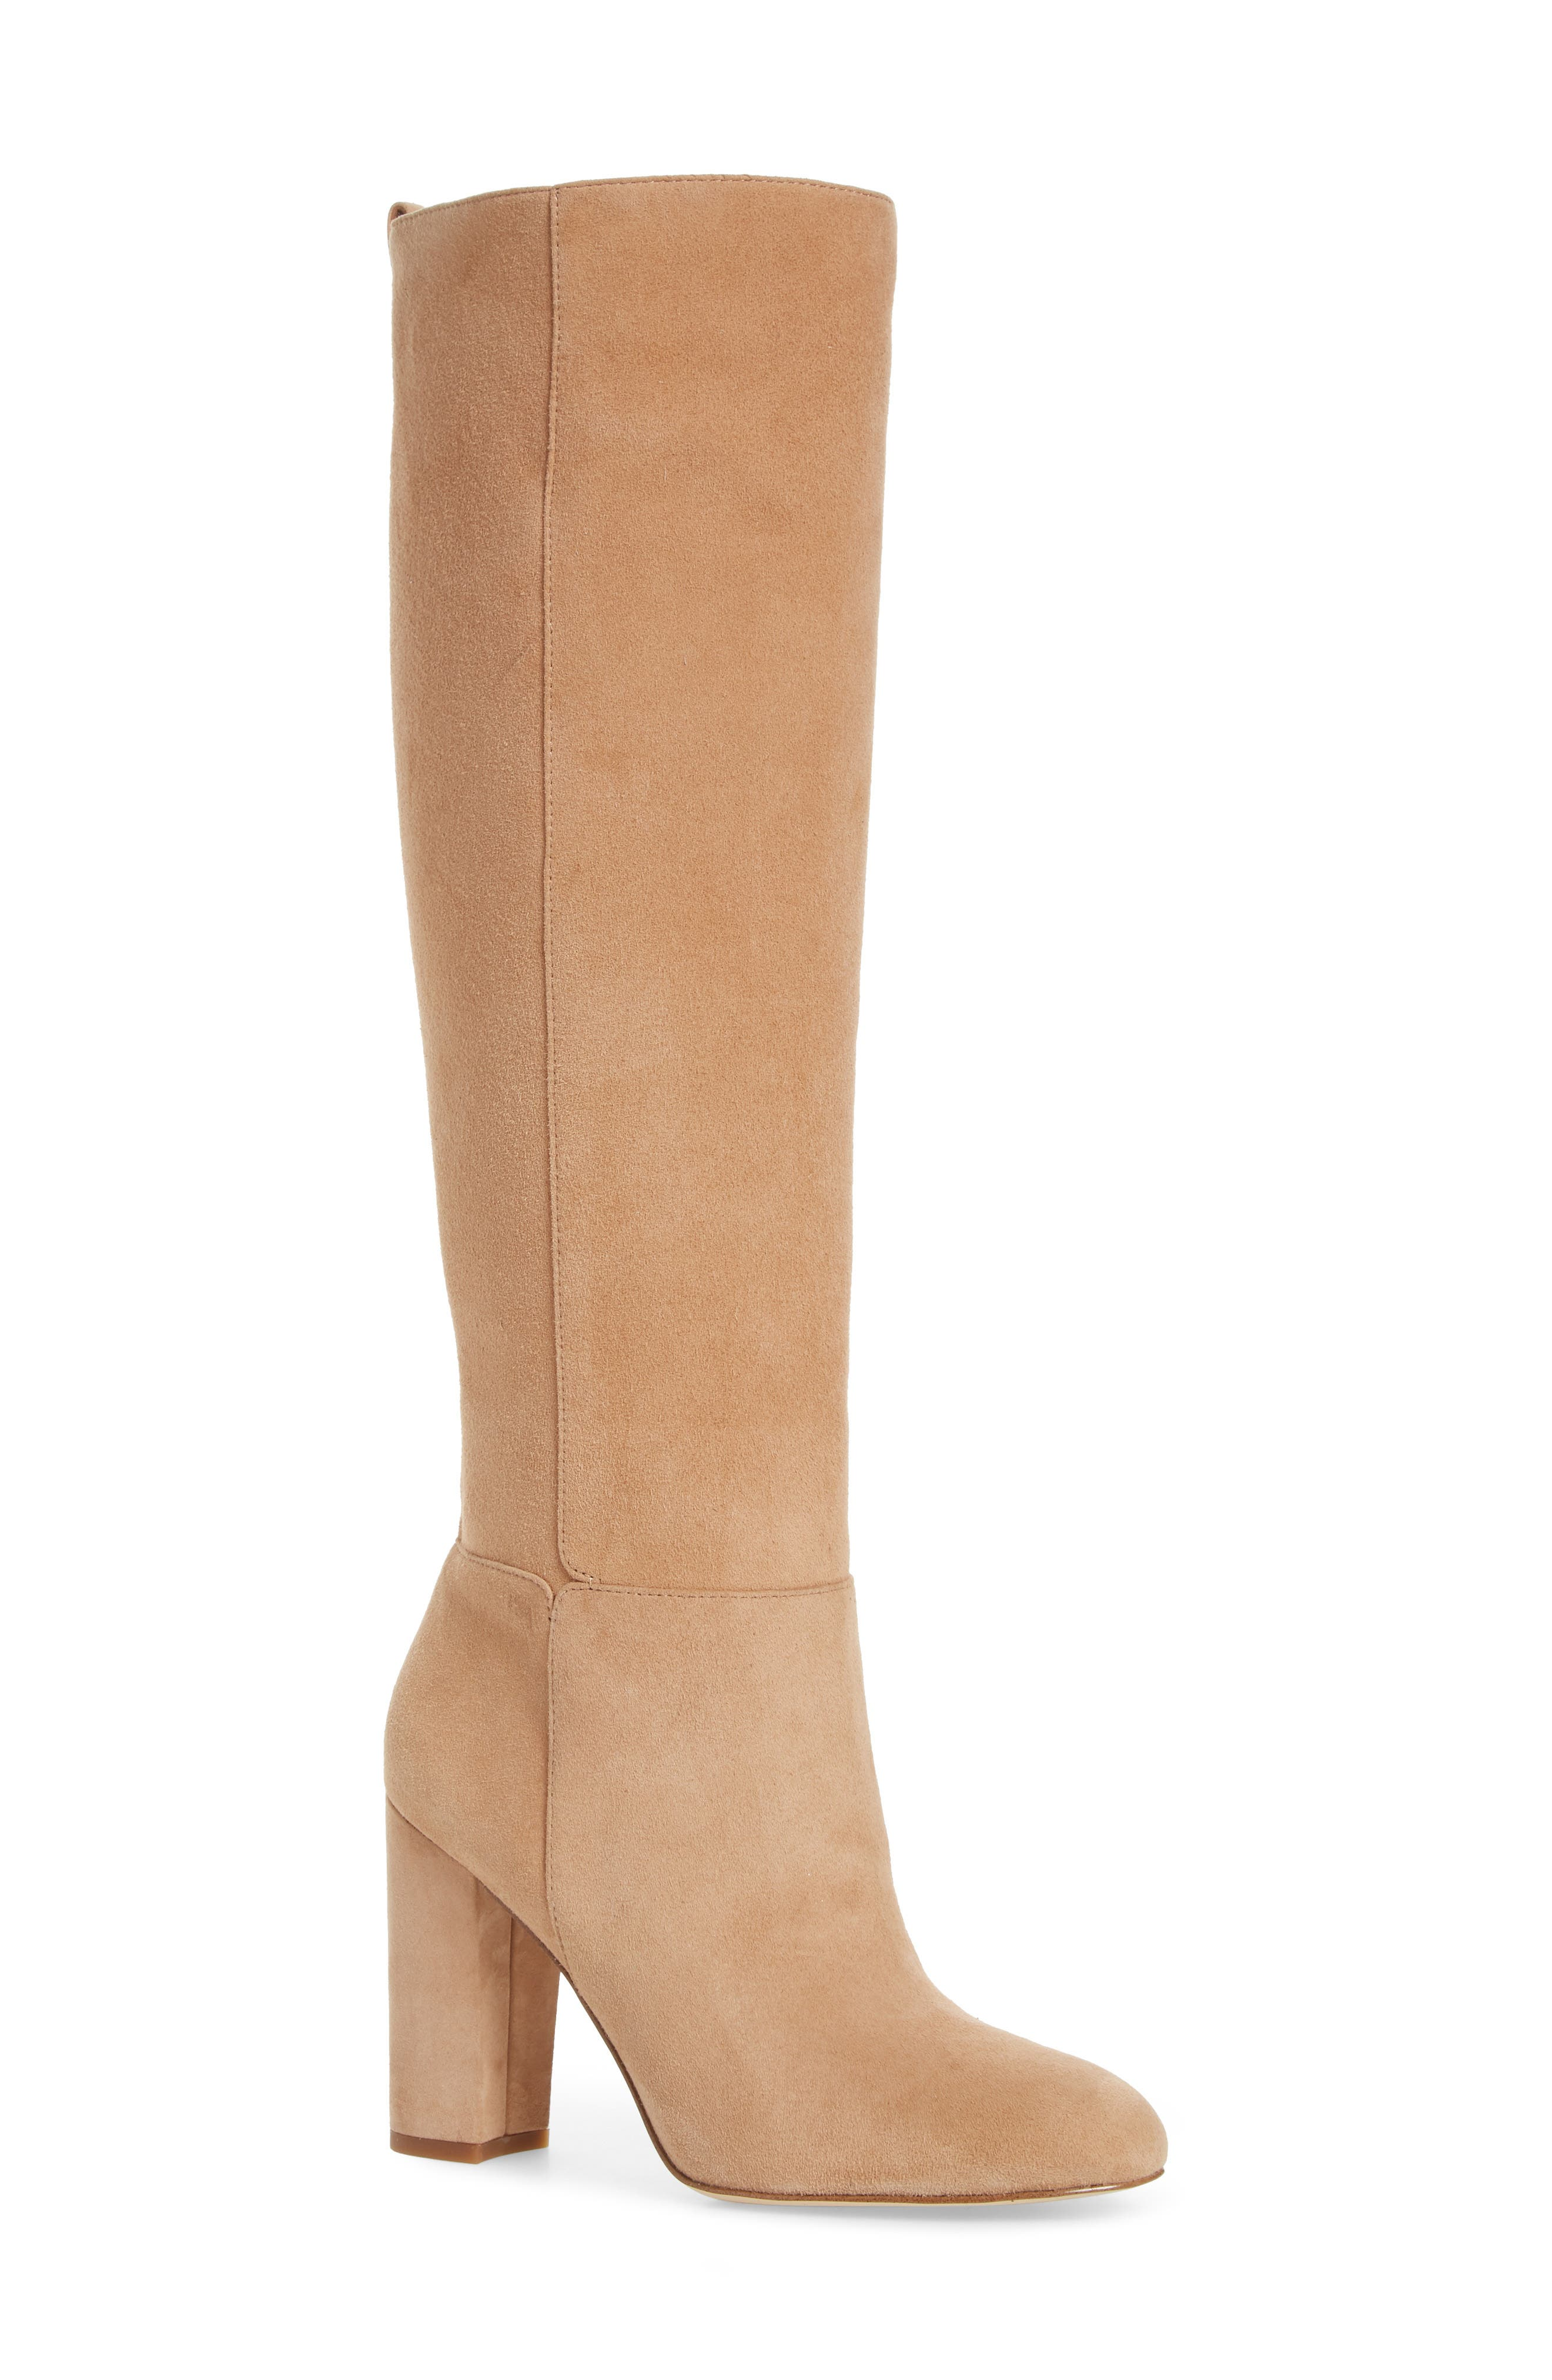 SAM EDELMAN Caprice Knee-High Boot, Main, color, 250